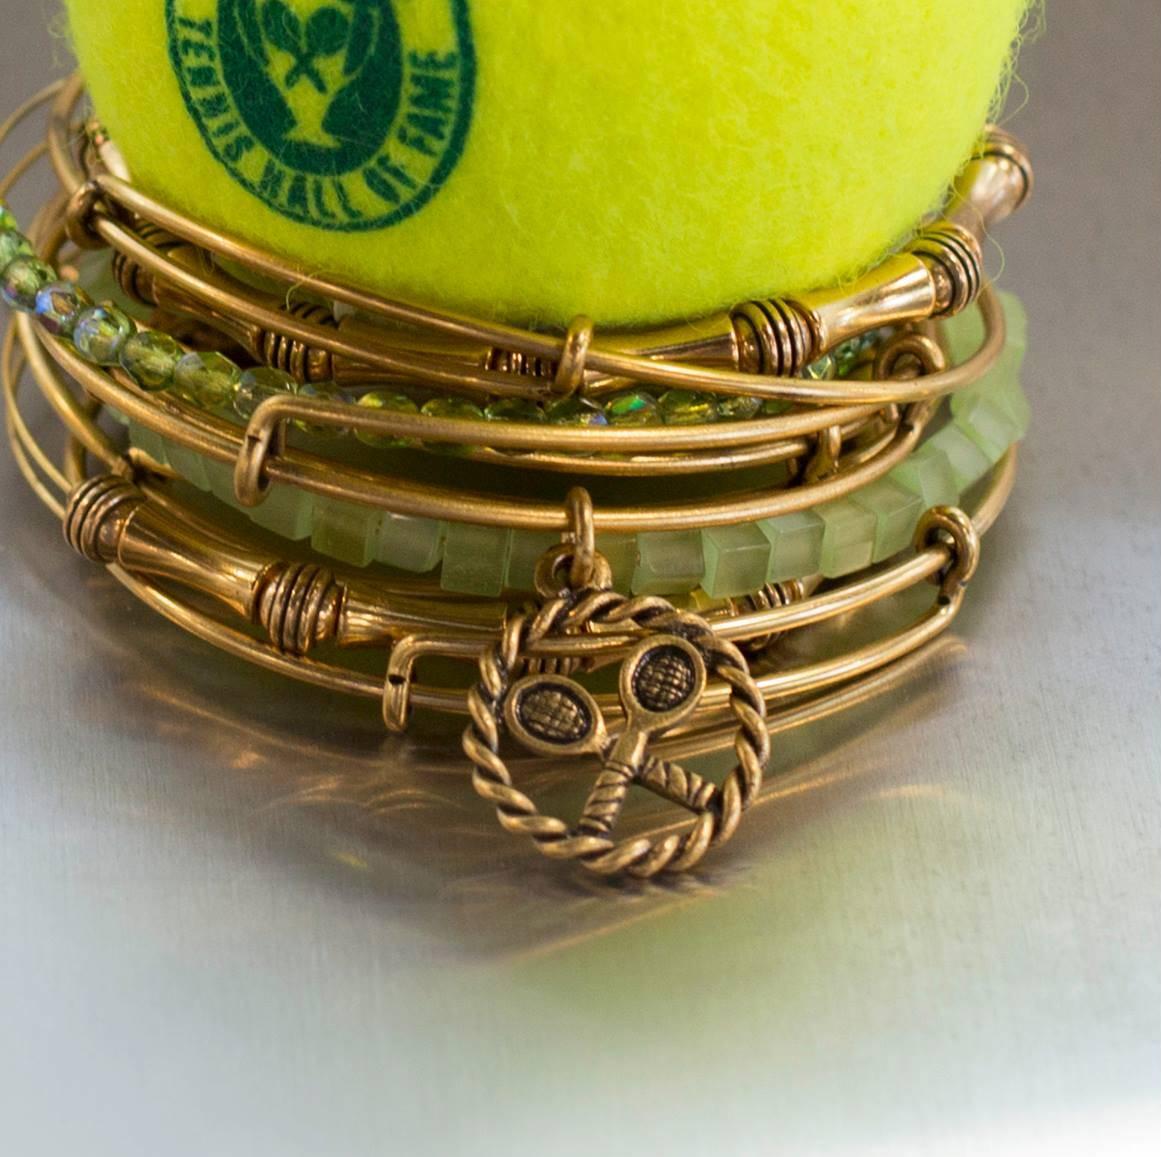 tennis bangle - Copy